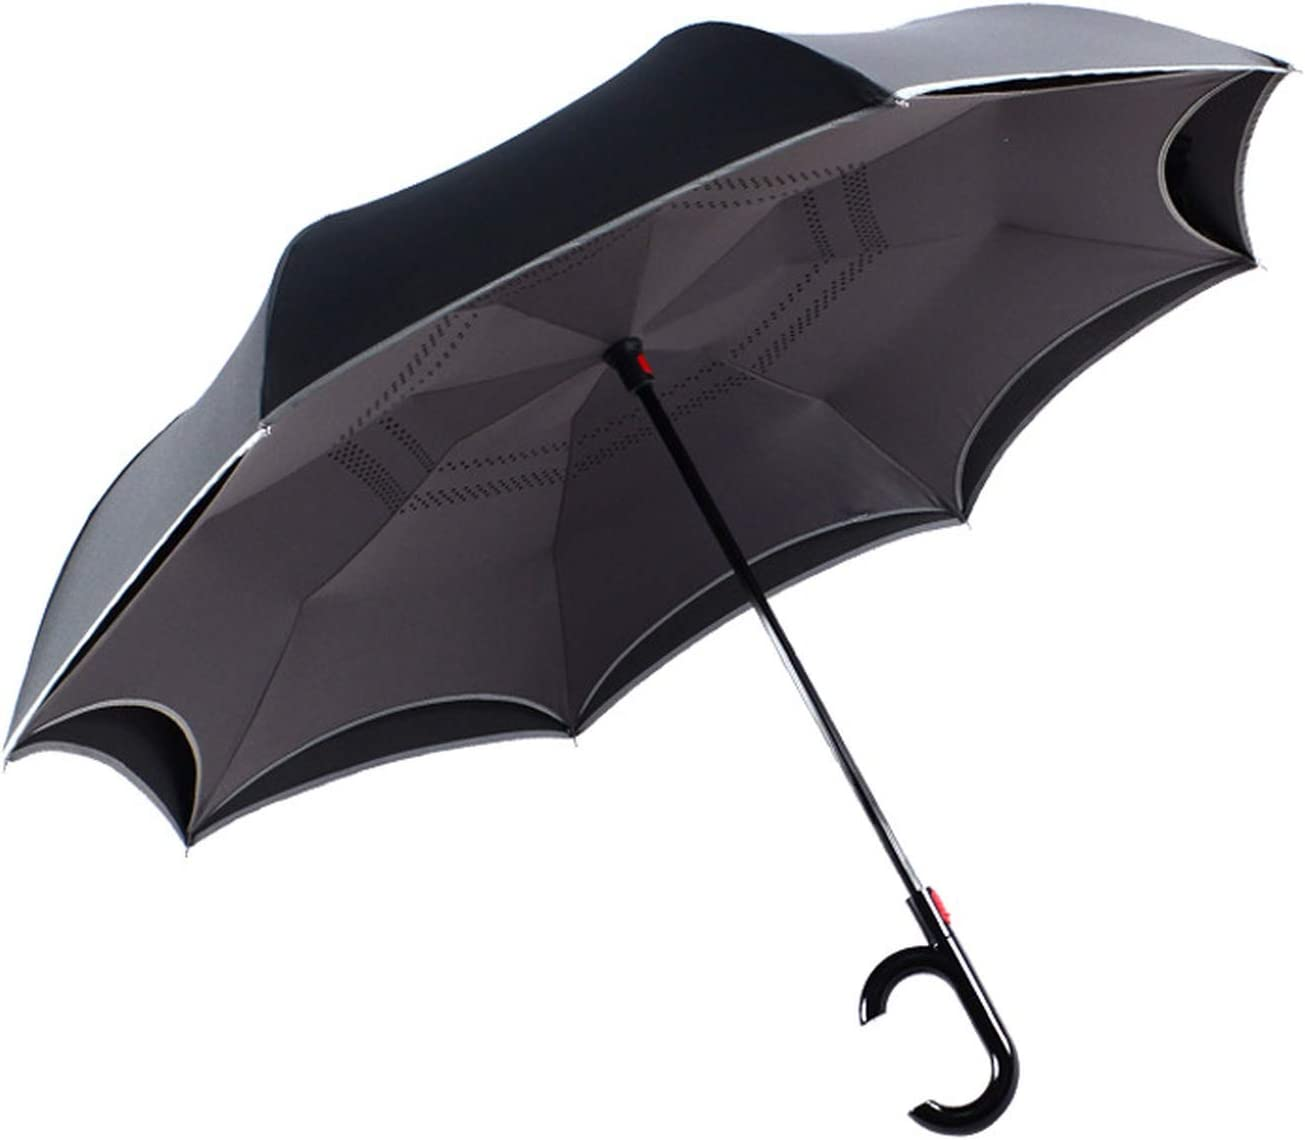 Windproof Automatic Reverse Umbrella Rain Women Folding Double Layer Black Color Umbrella Rain Gear Household Merchandises,Gray